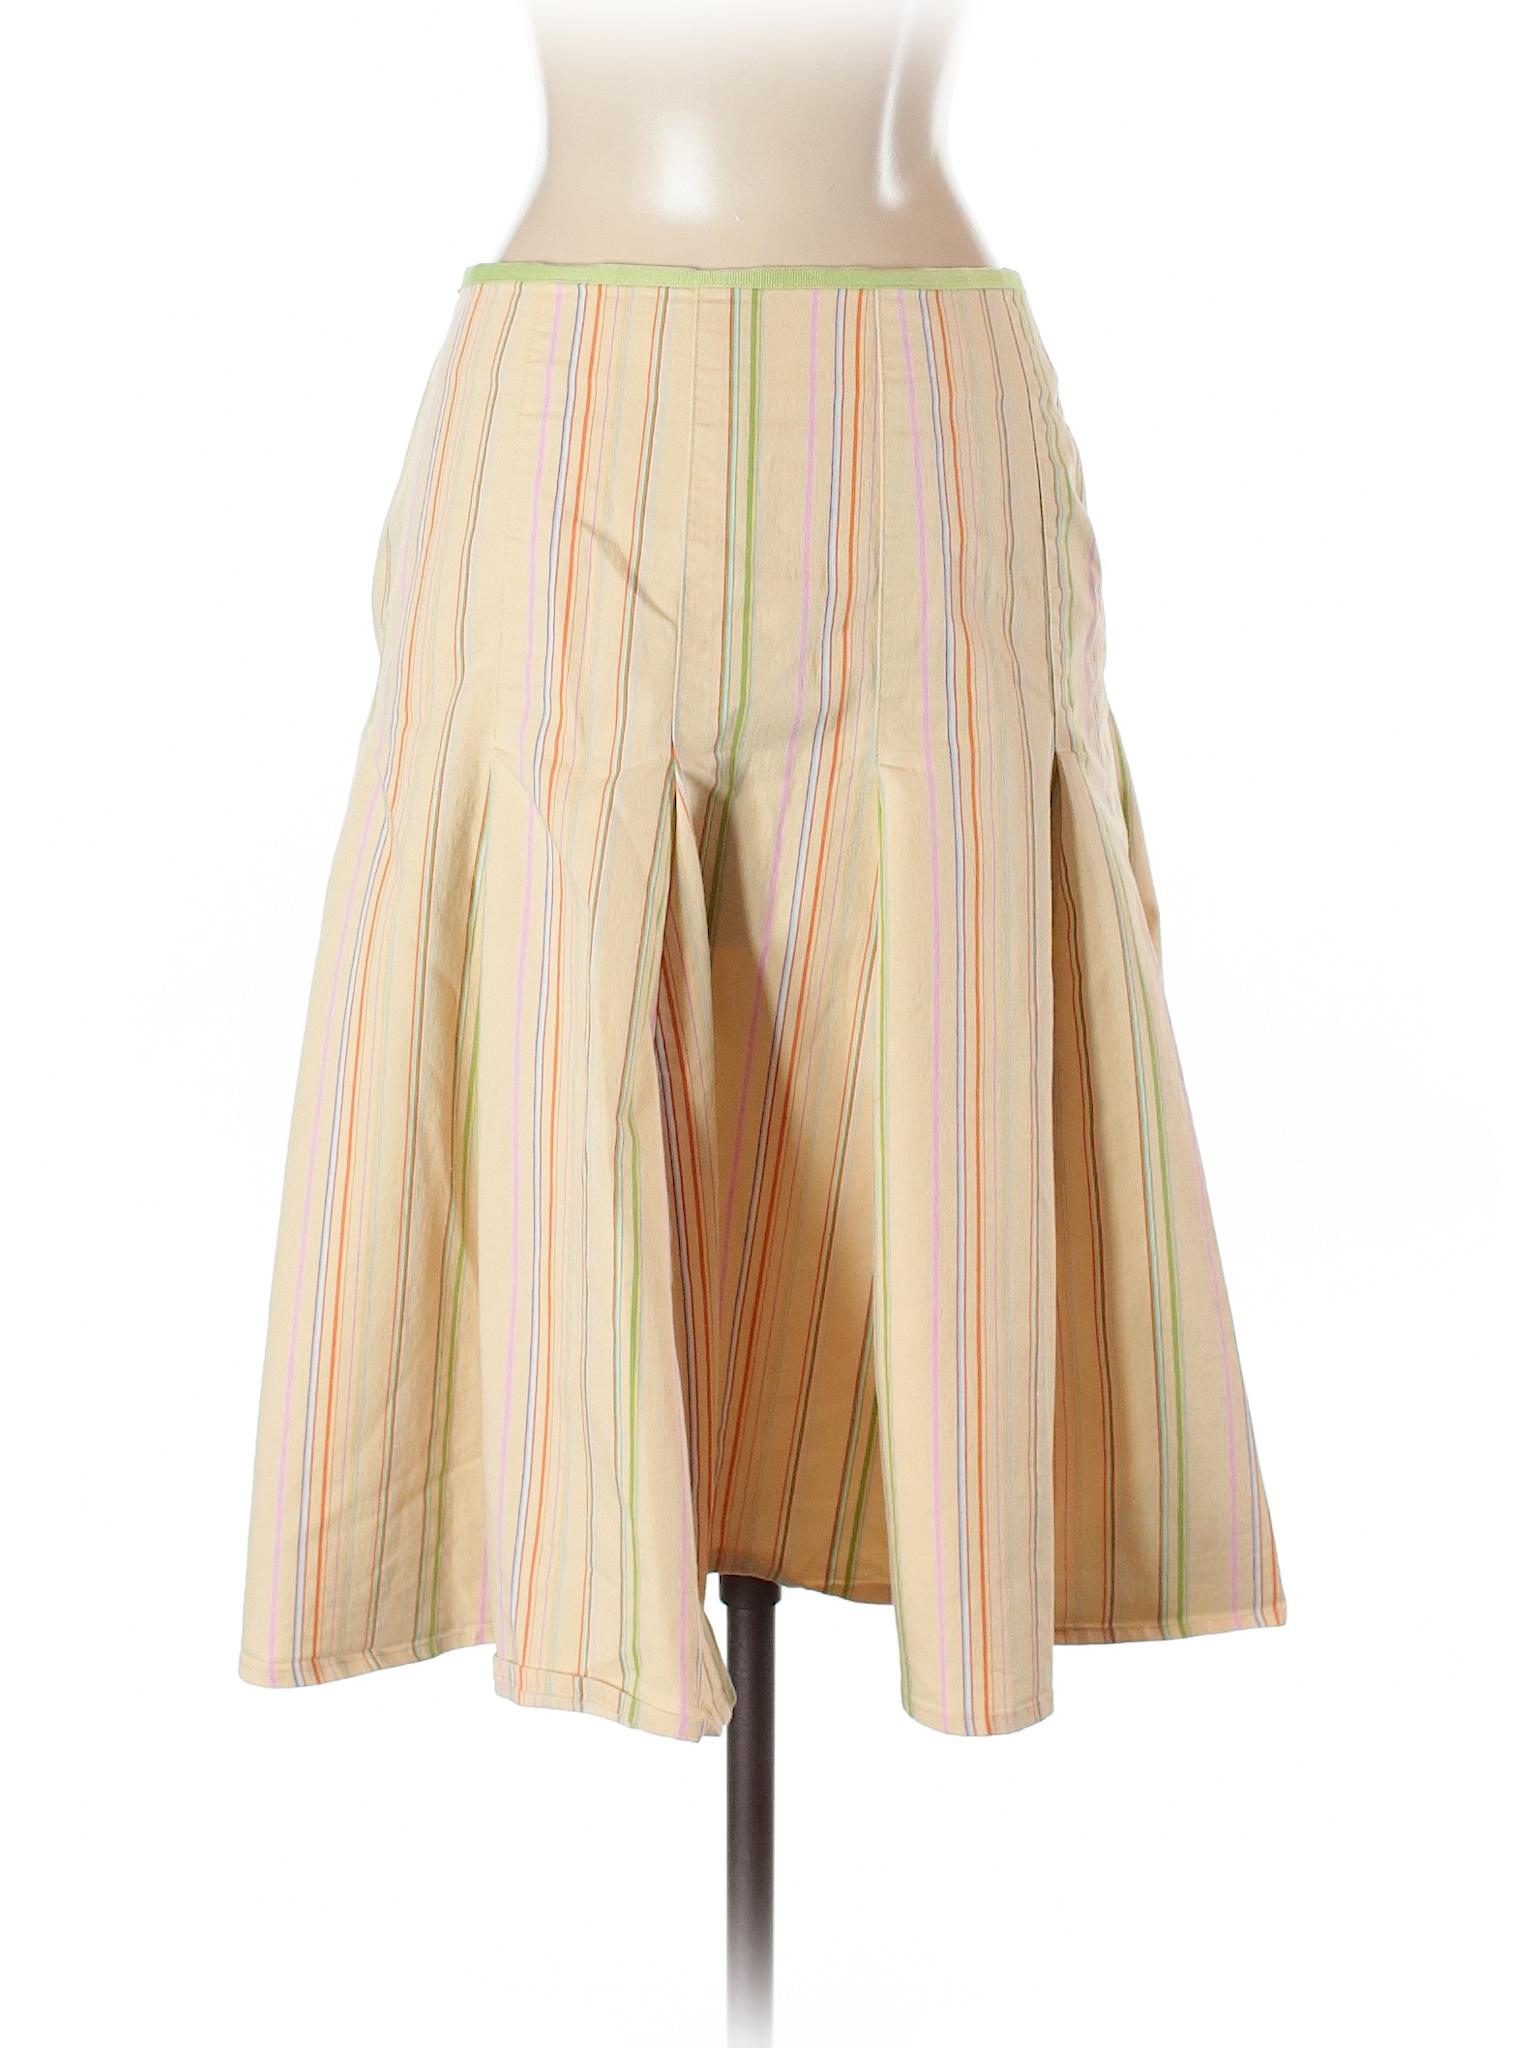 Skirt Boutique Boutique Casual Casual cyHqTWZI